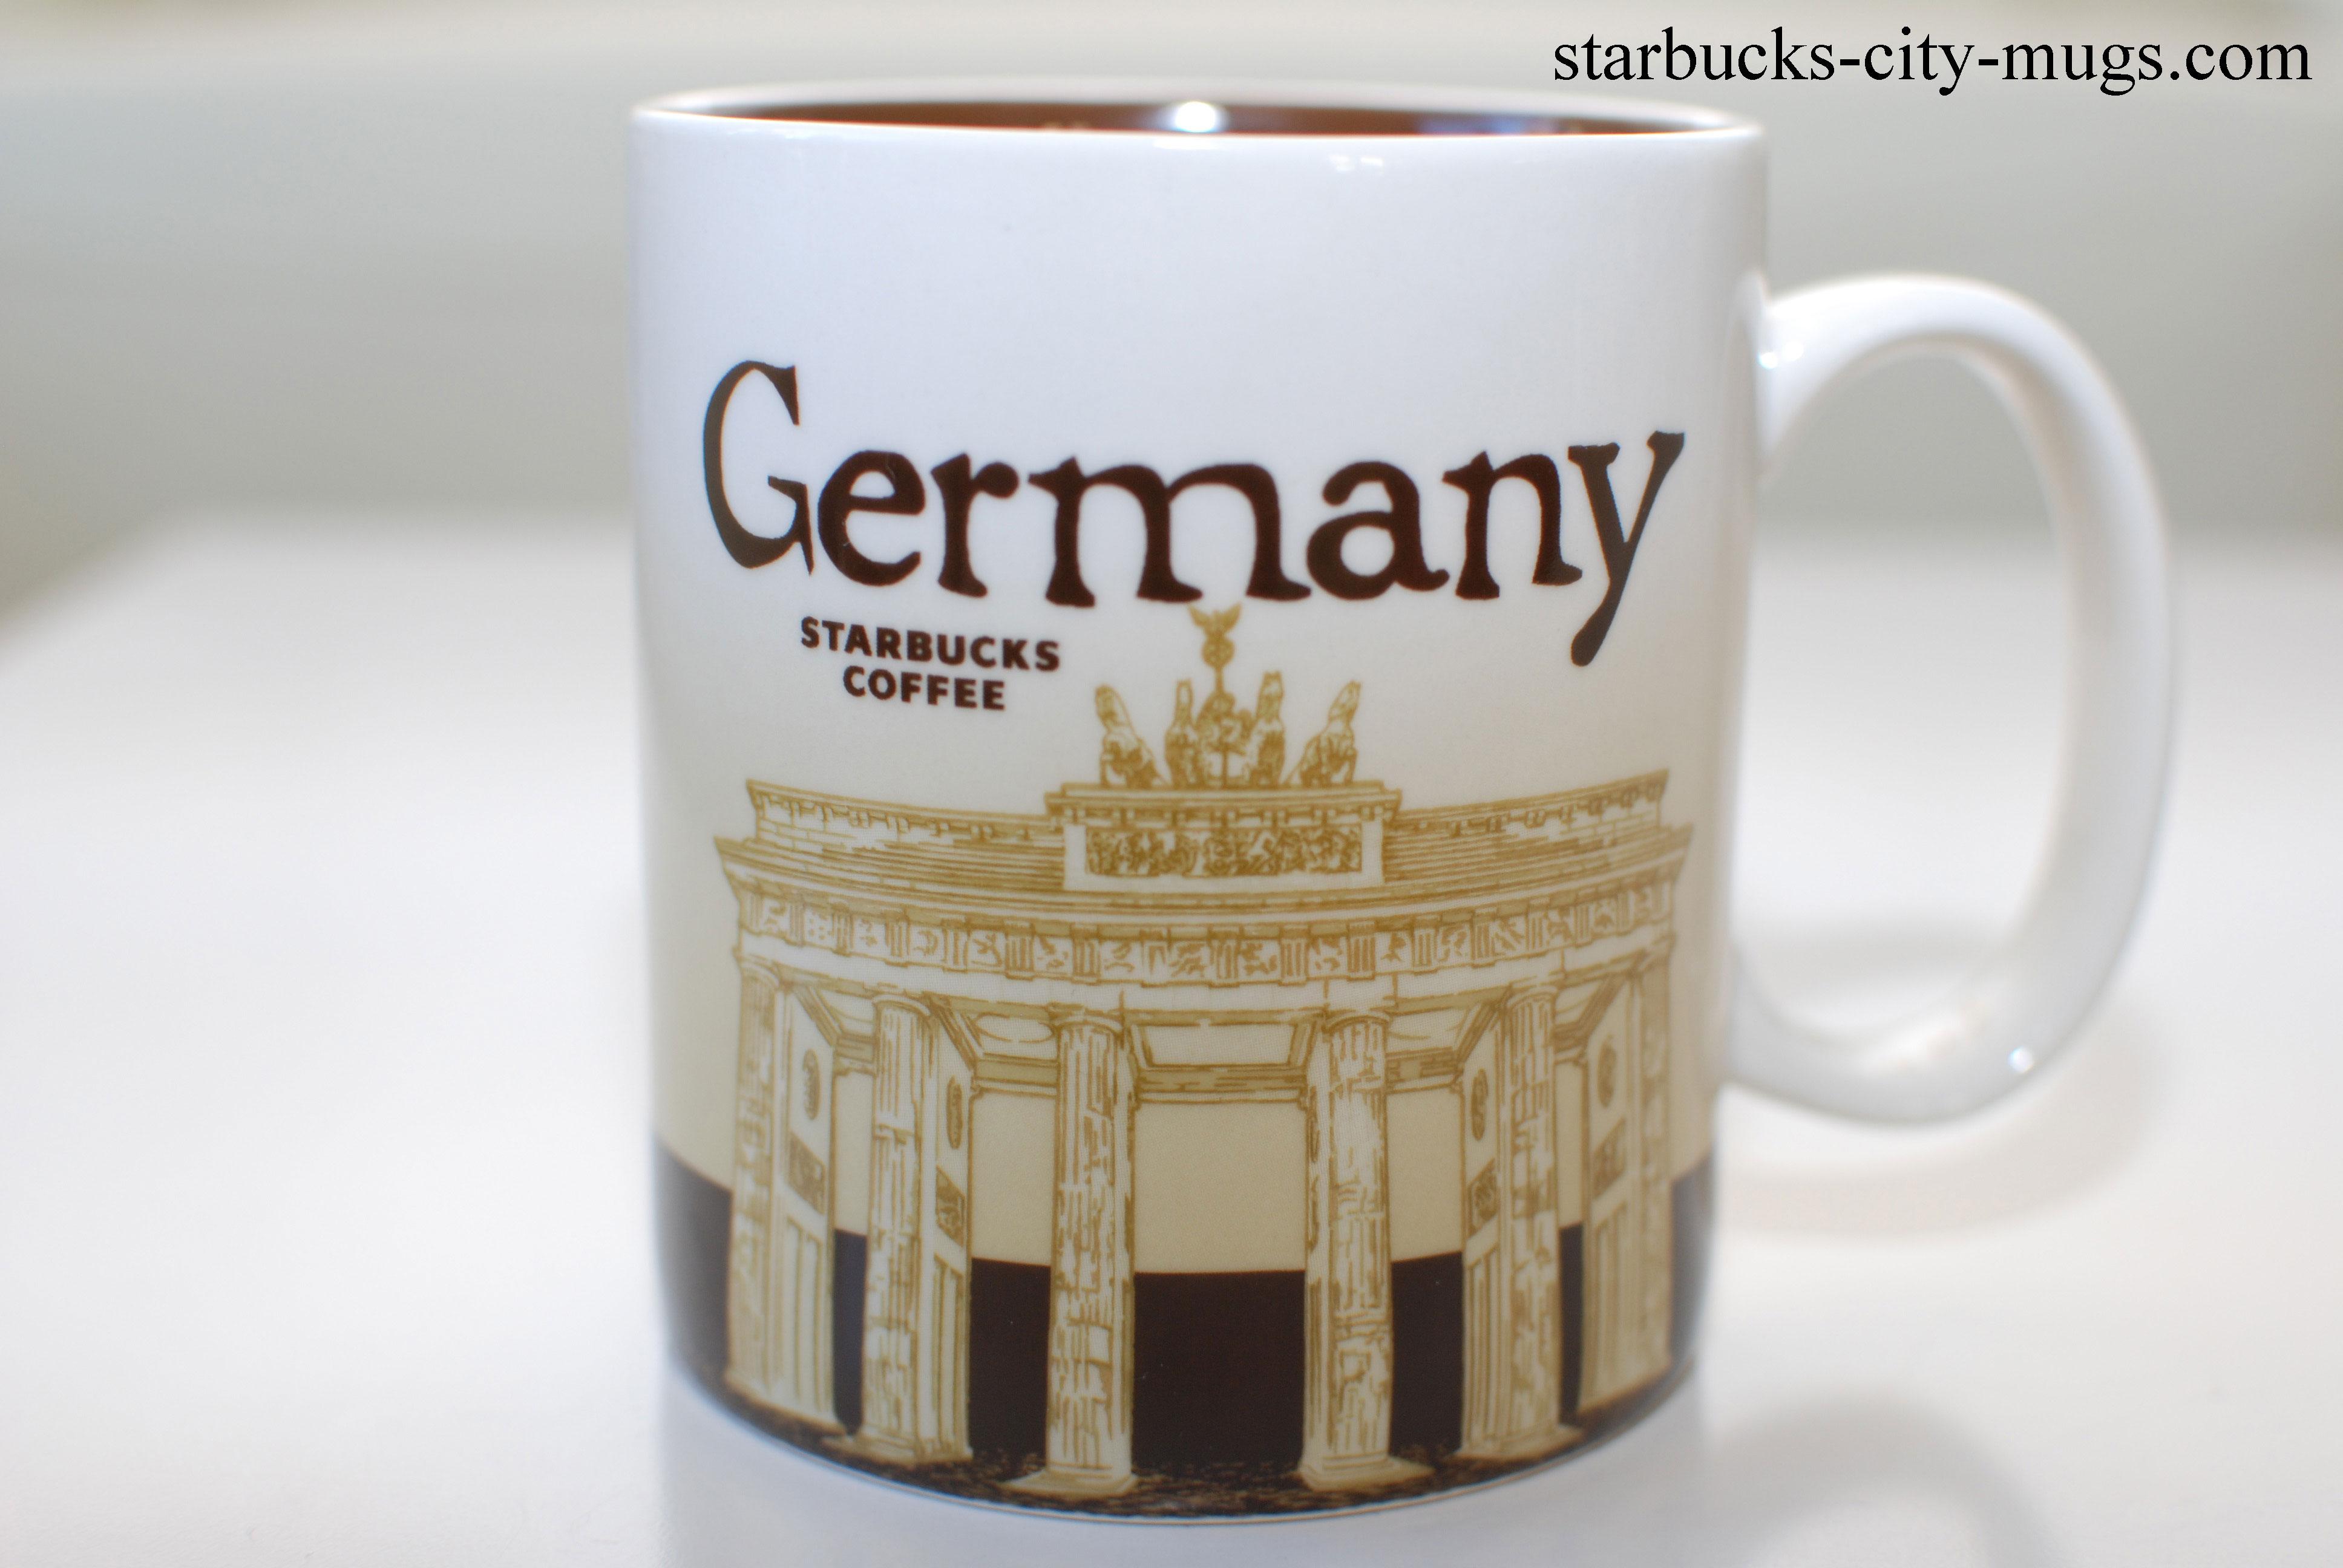 germany starbucks city mugs. Black Bedroom Furniture Sets. Home Design Ideas